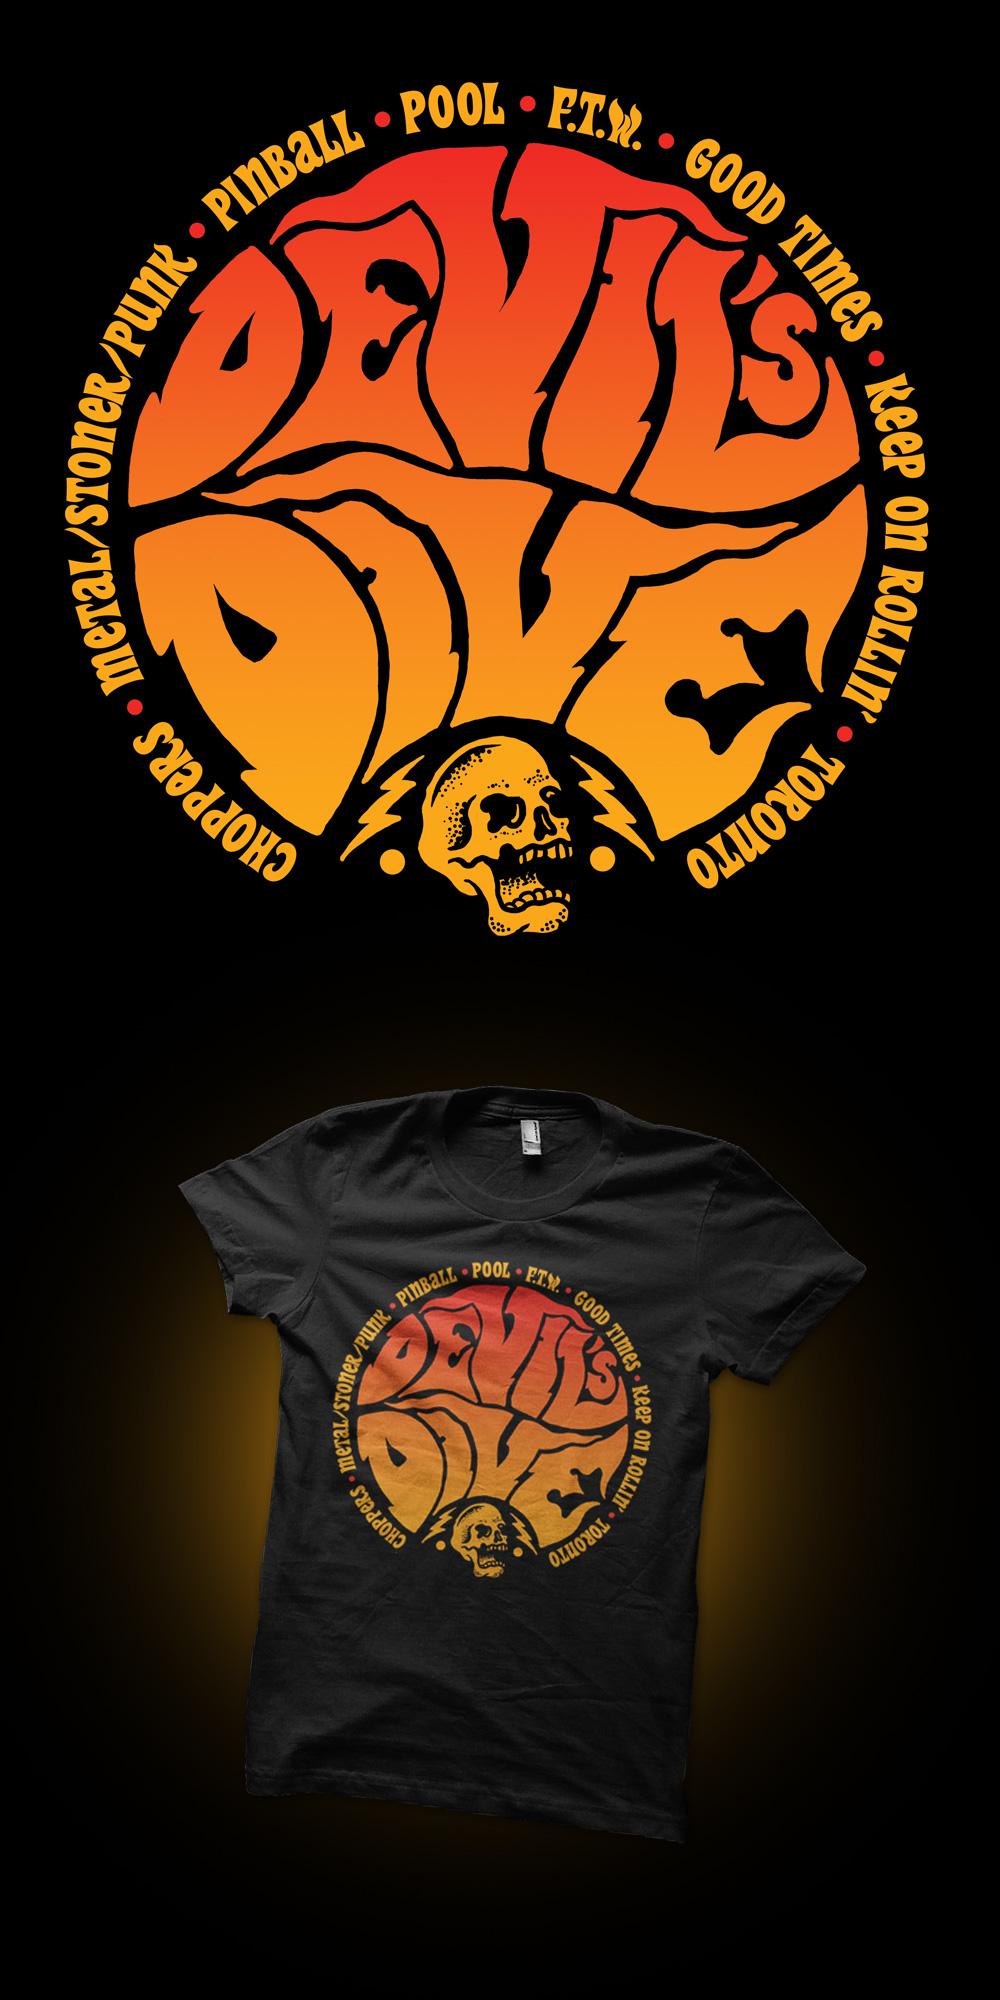 The Devil's Dive, Devils Dive, Choppers, Illustration, Logo Design, 70's choppers, rock-n-roll, punk rock, stoner rock, movies, ride in, bike night, drawing, graphic design, skull, bolts, FTW, art, Toronto